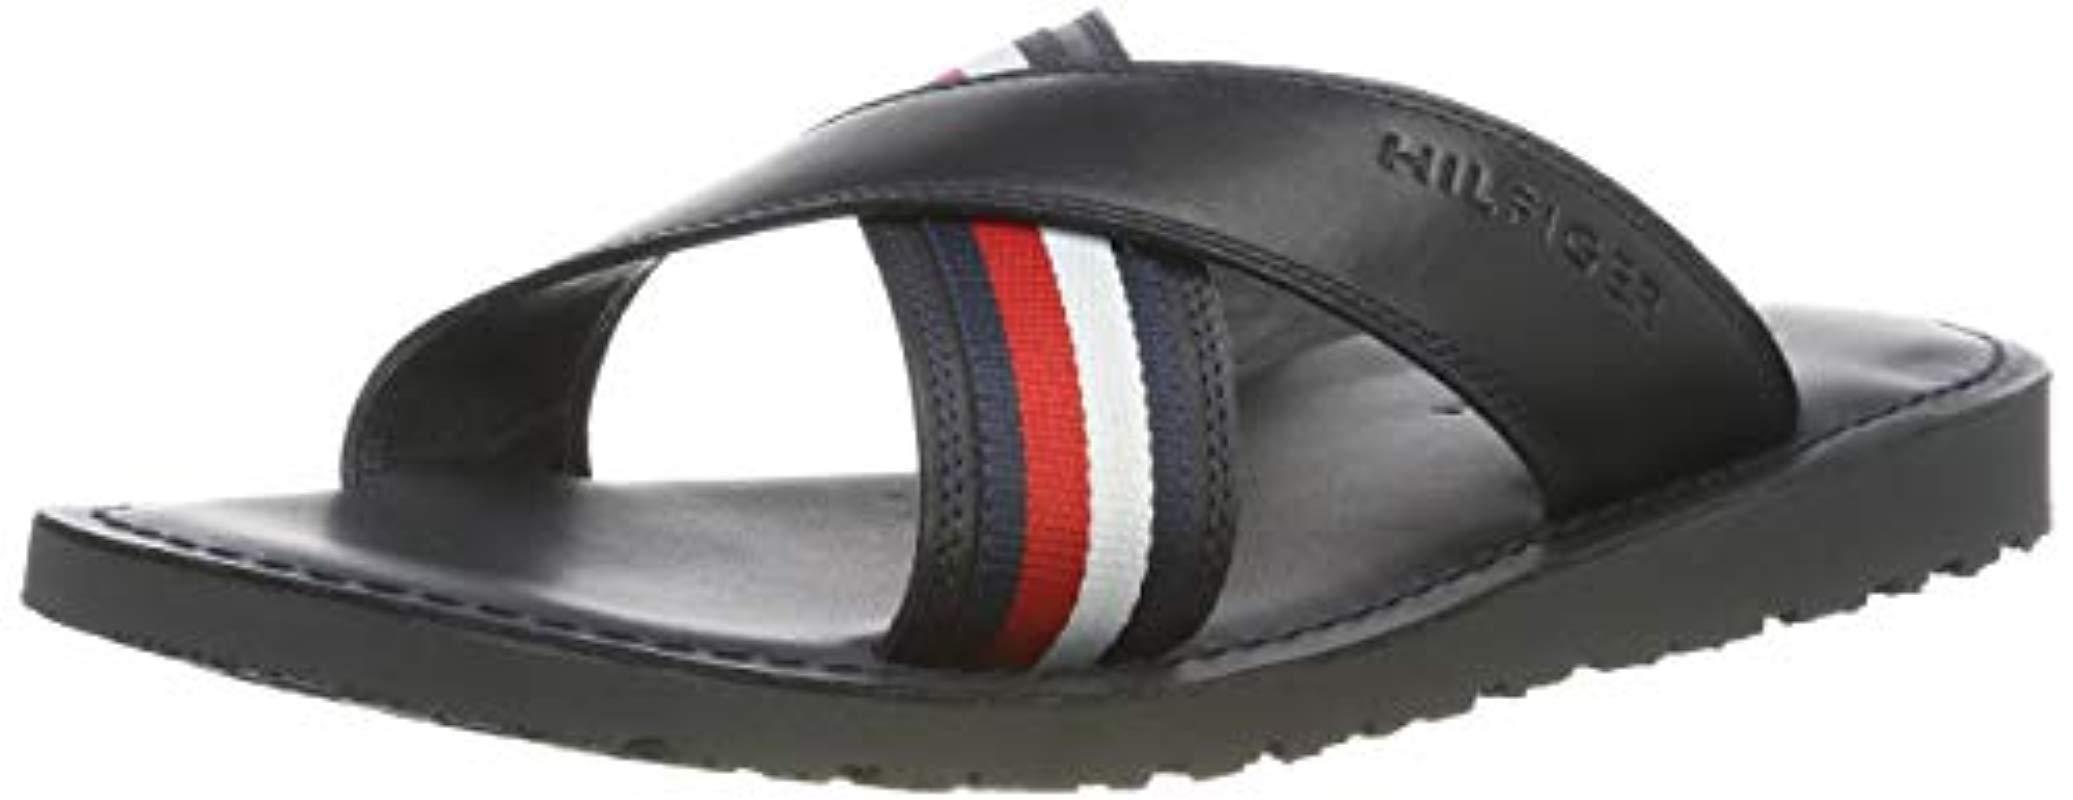 d0c6bf82f91d Tommy Hilfiger Criss Cross Leather Sandal Flip Flops